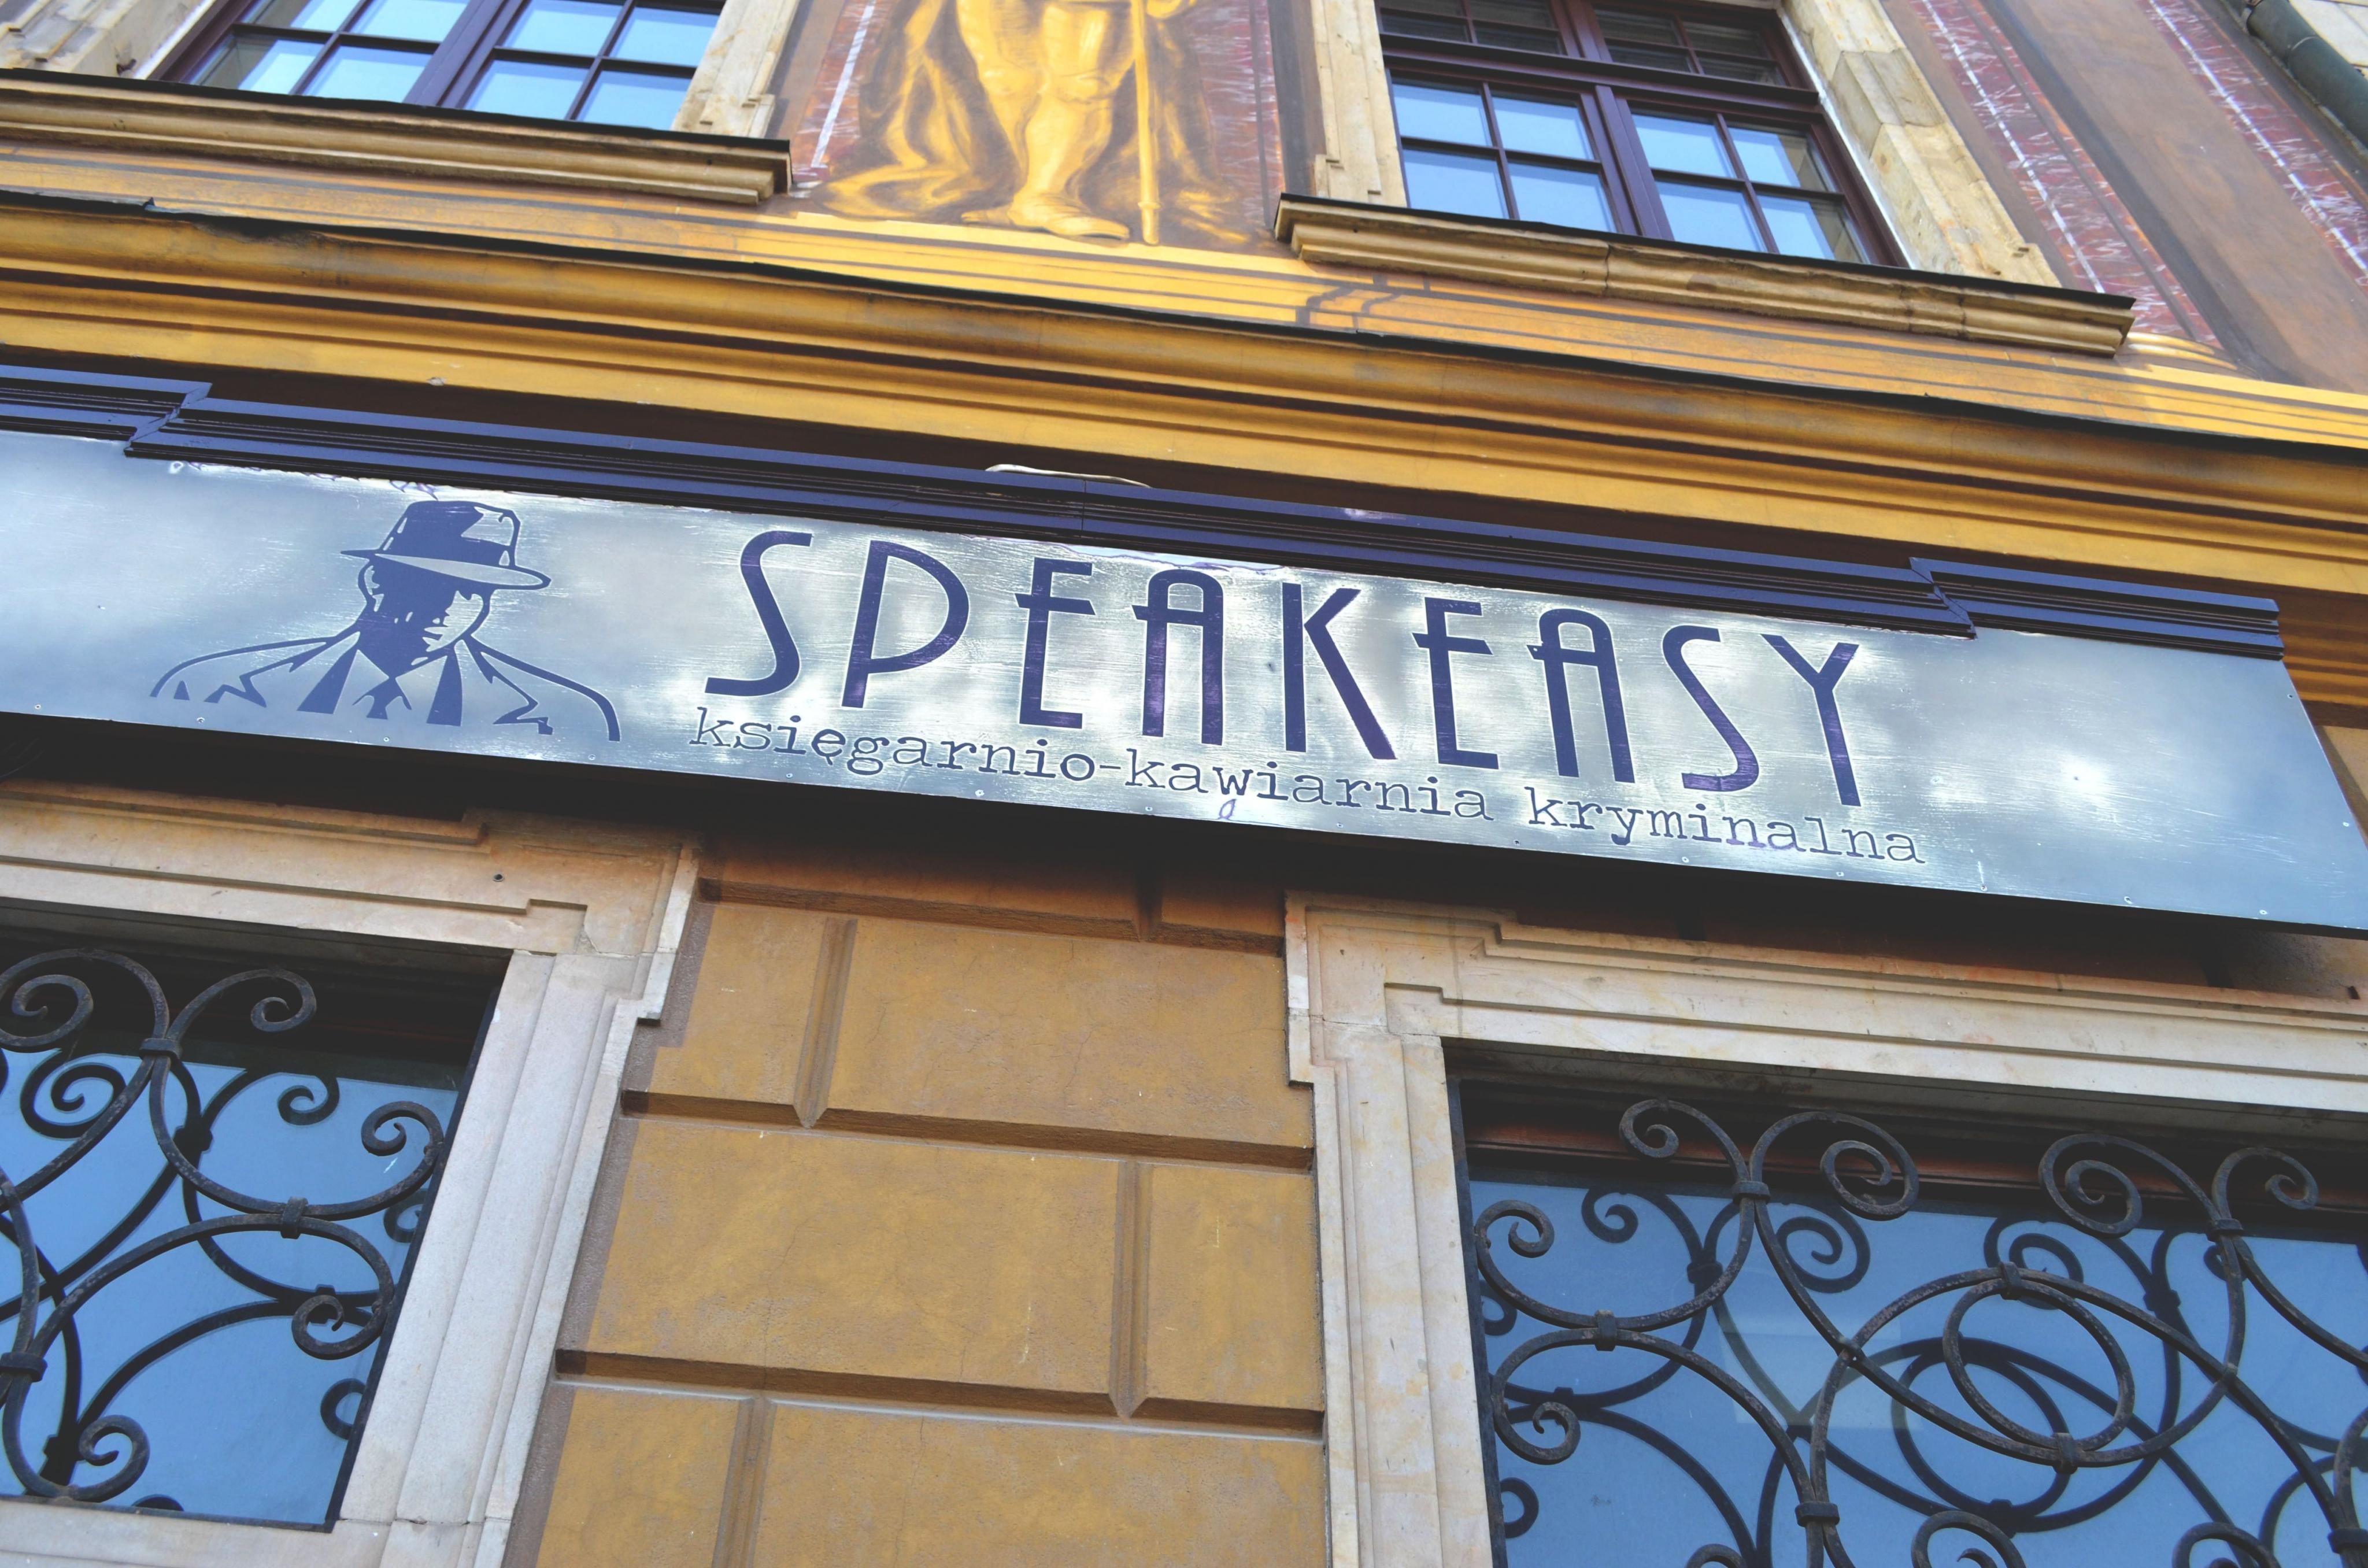 SPEAKEASY!